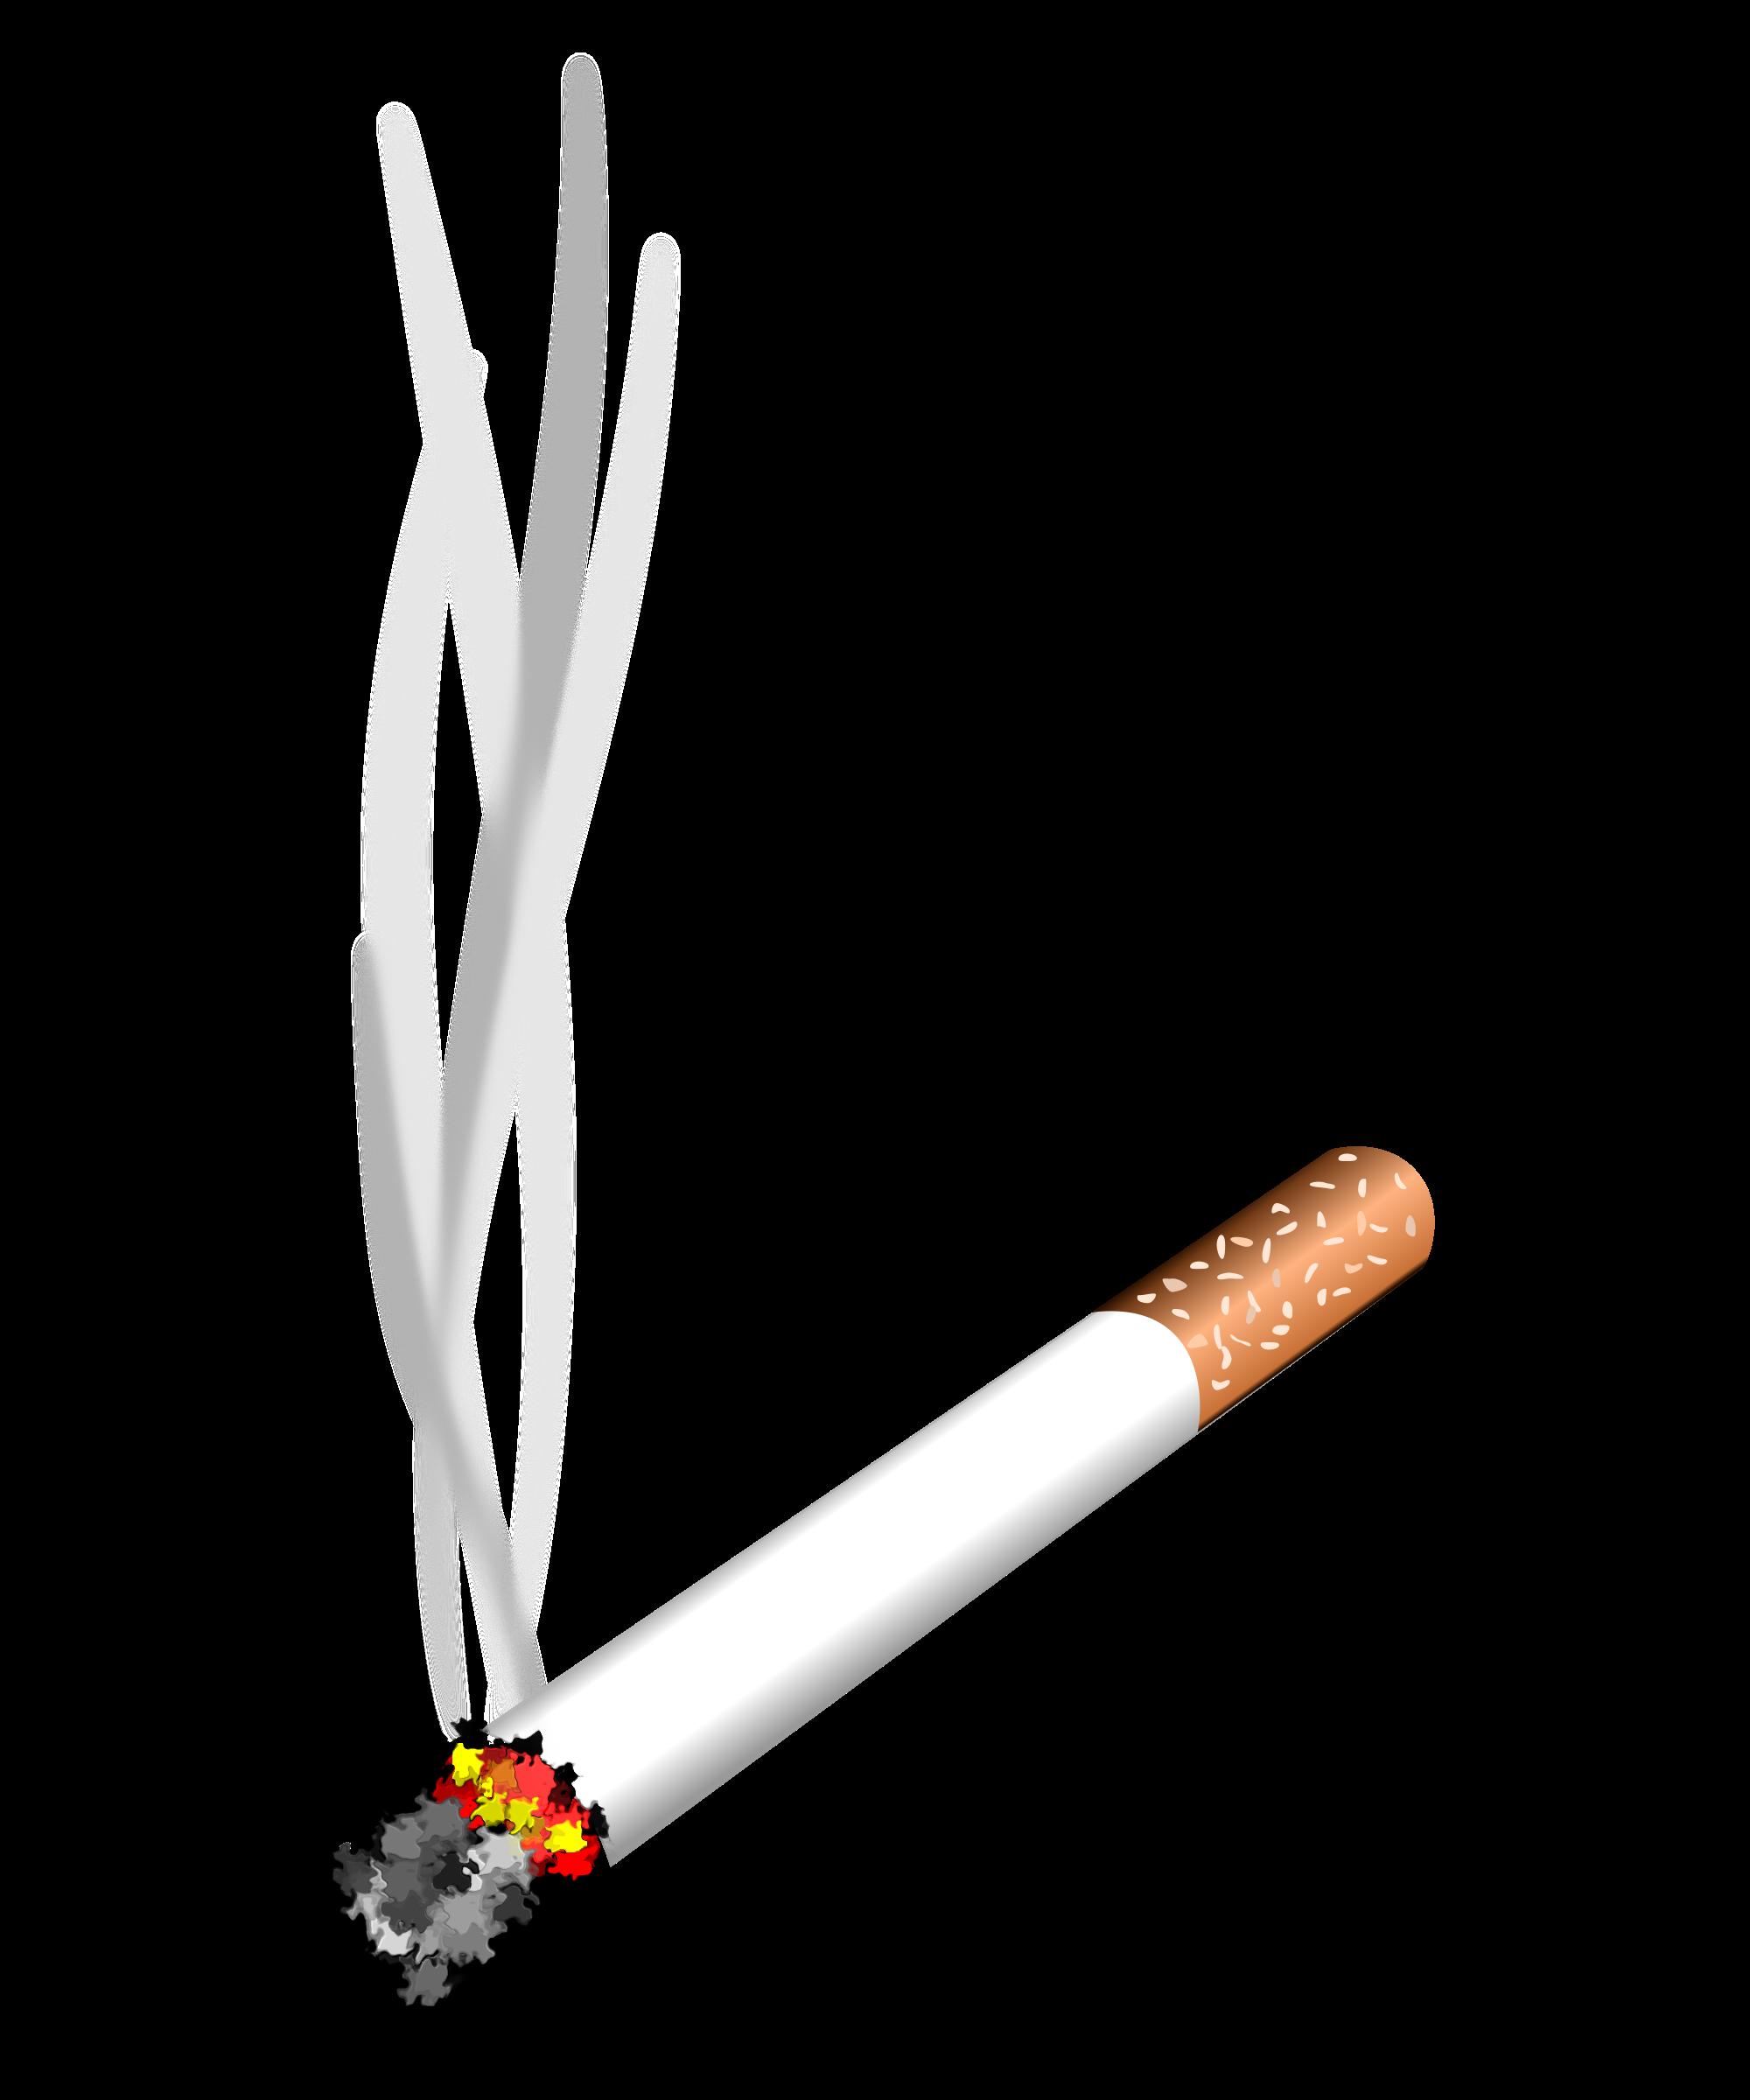 Download Thug Life Cigarette Transparent Image HQ PNG ...